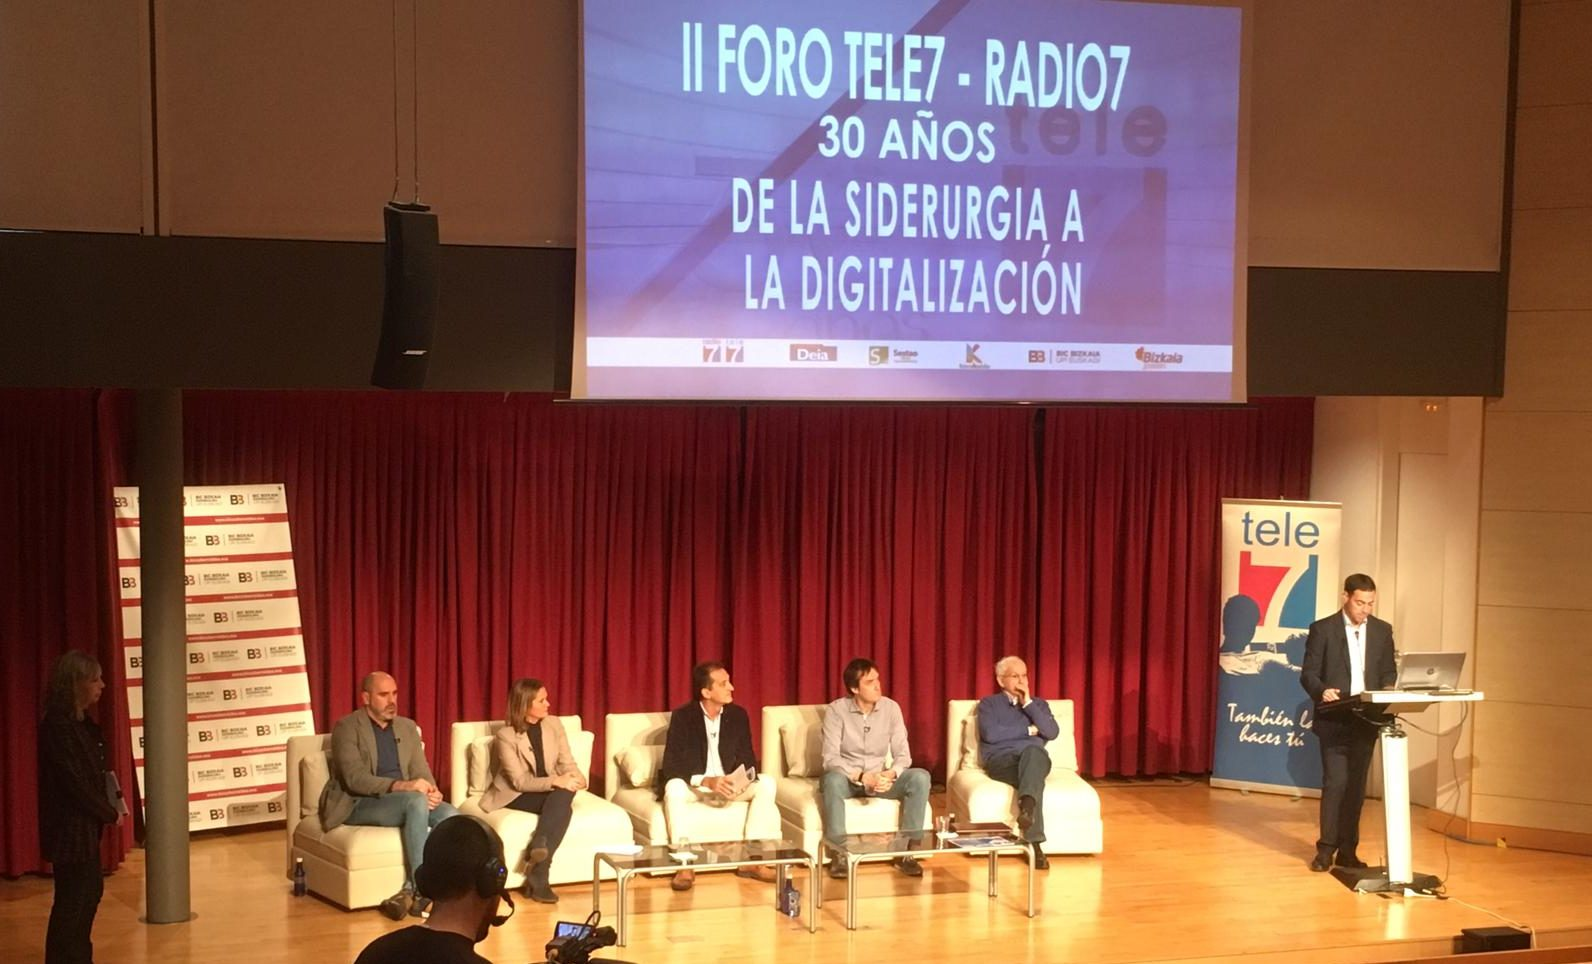 II foro tele7/radio7